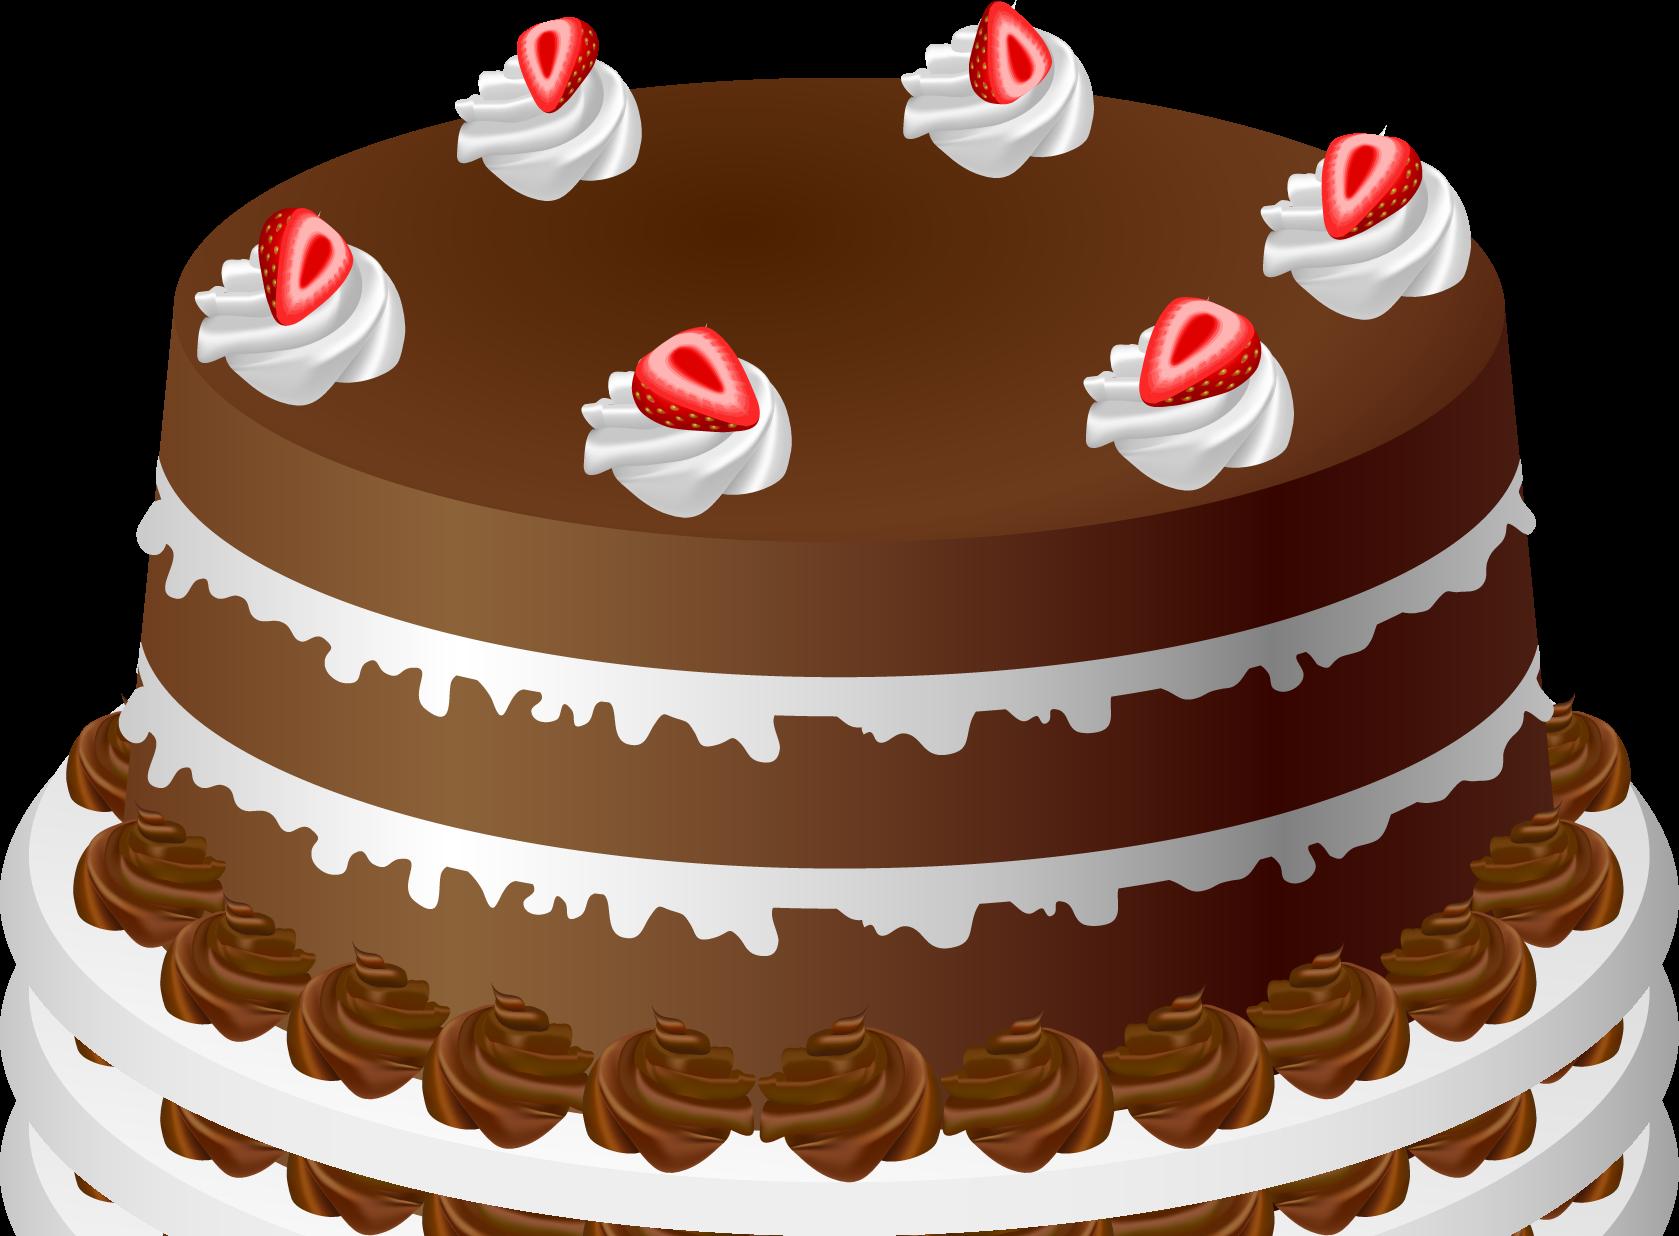 Dessert cakes clipart tumundografico